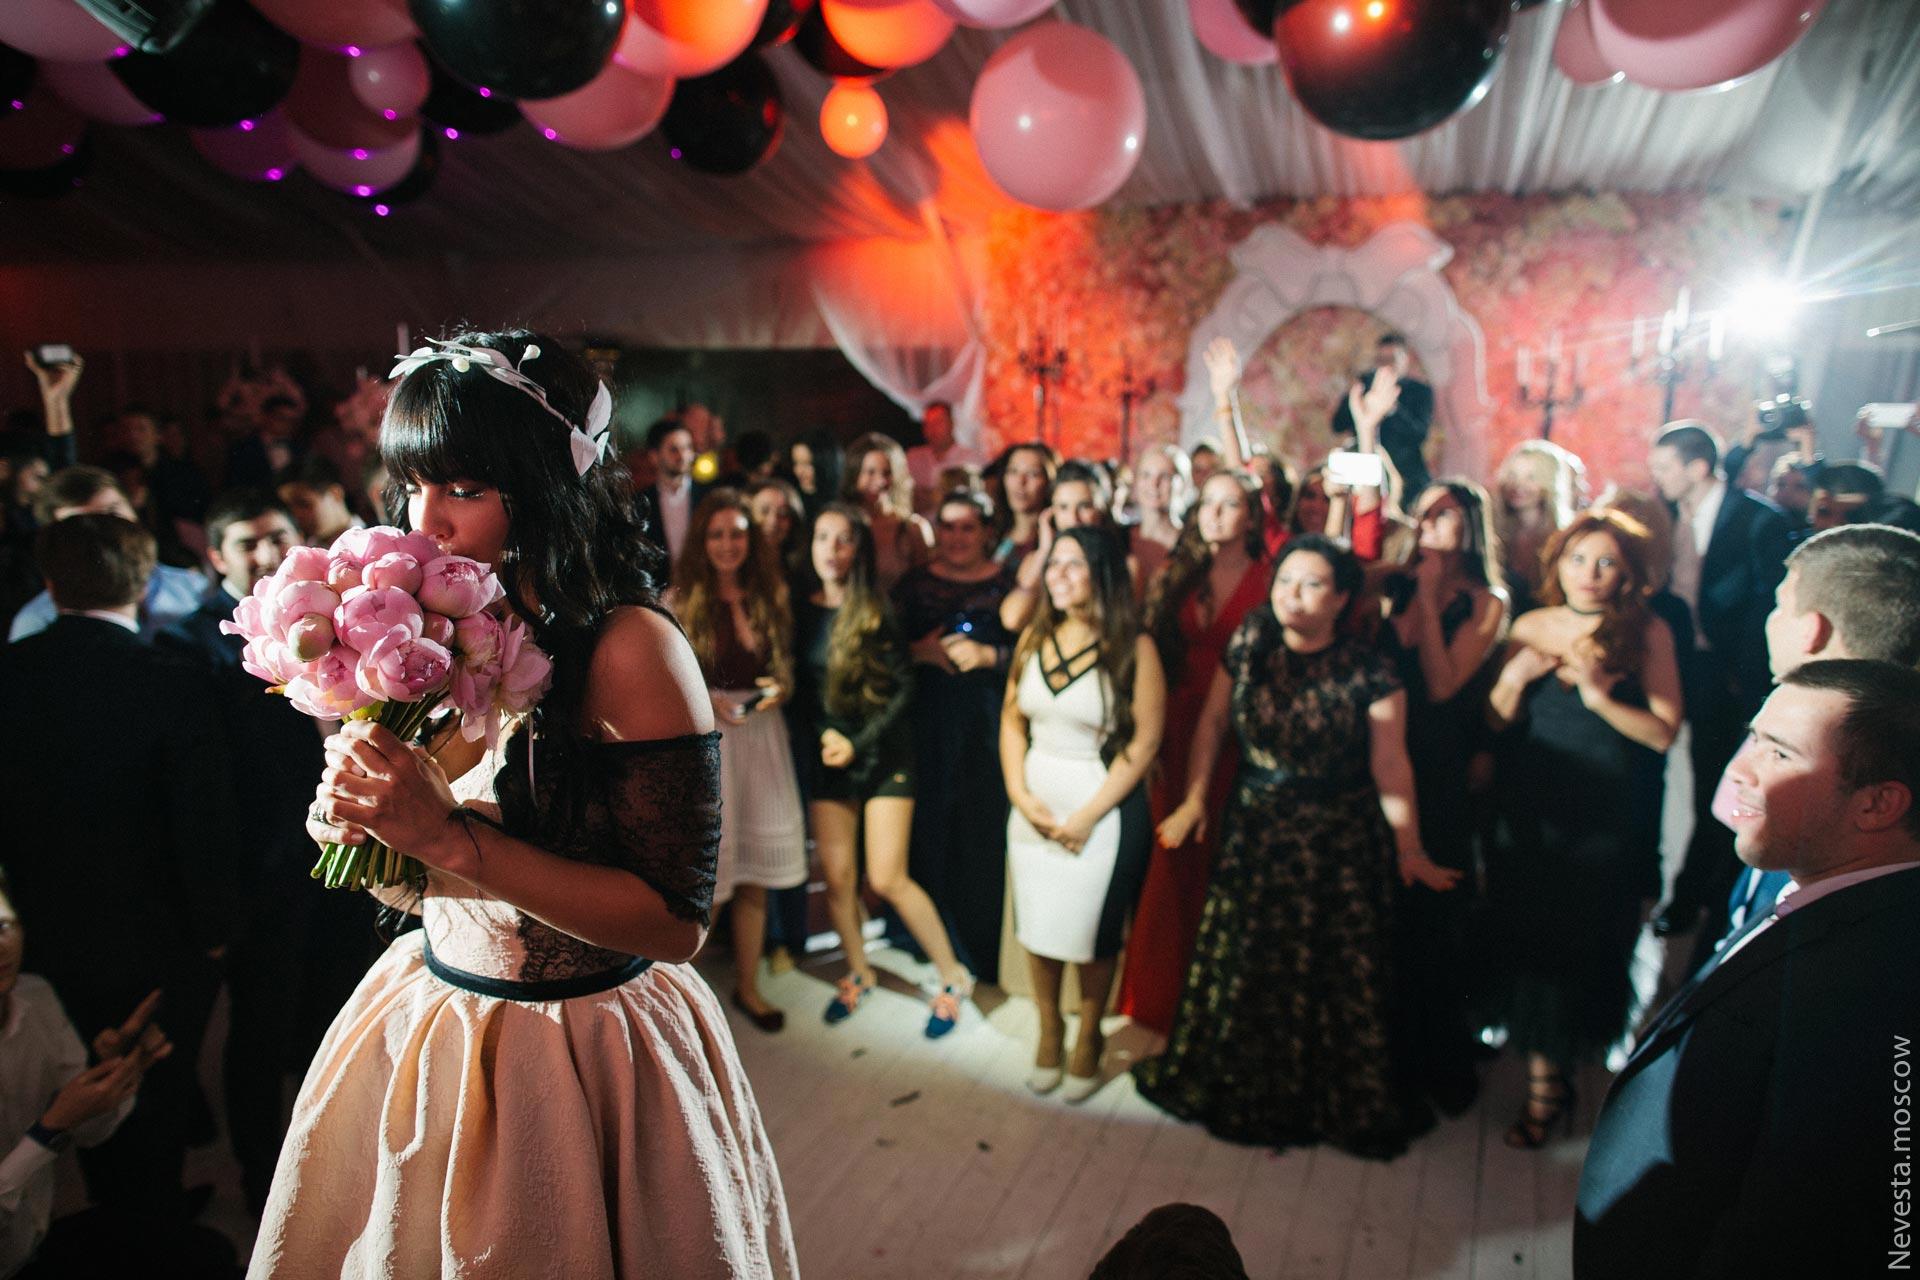 Свадьба Нелли Ермолаевой и Кирилла Андреева фото 57